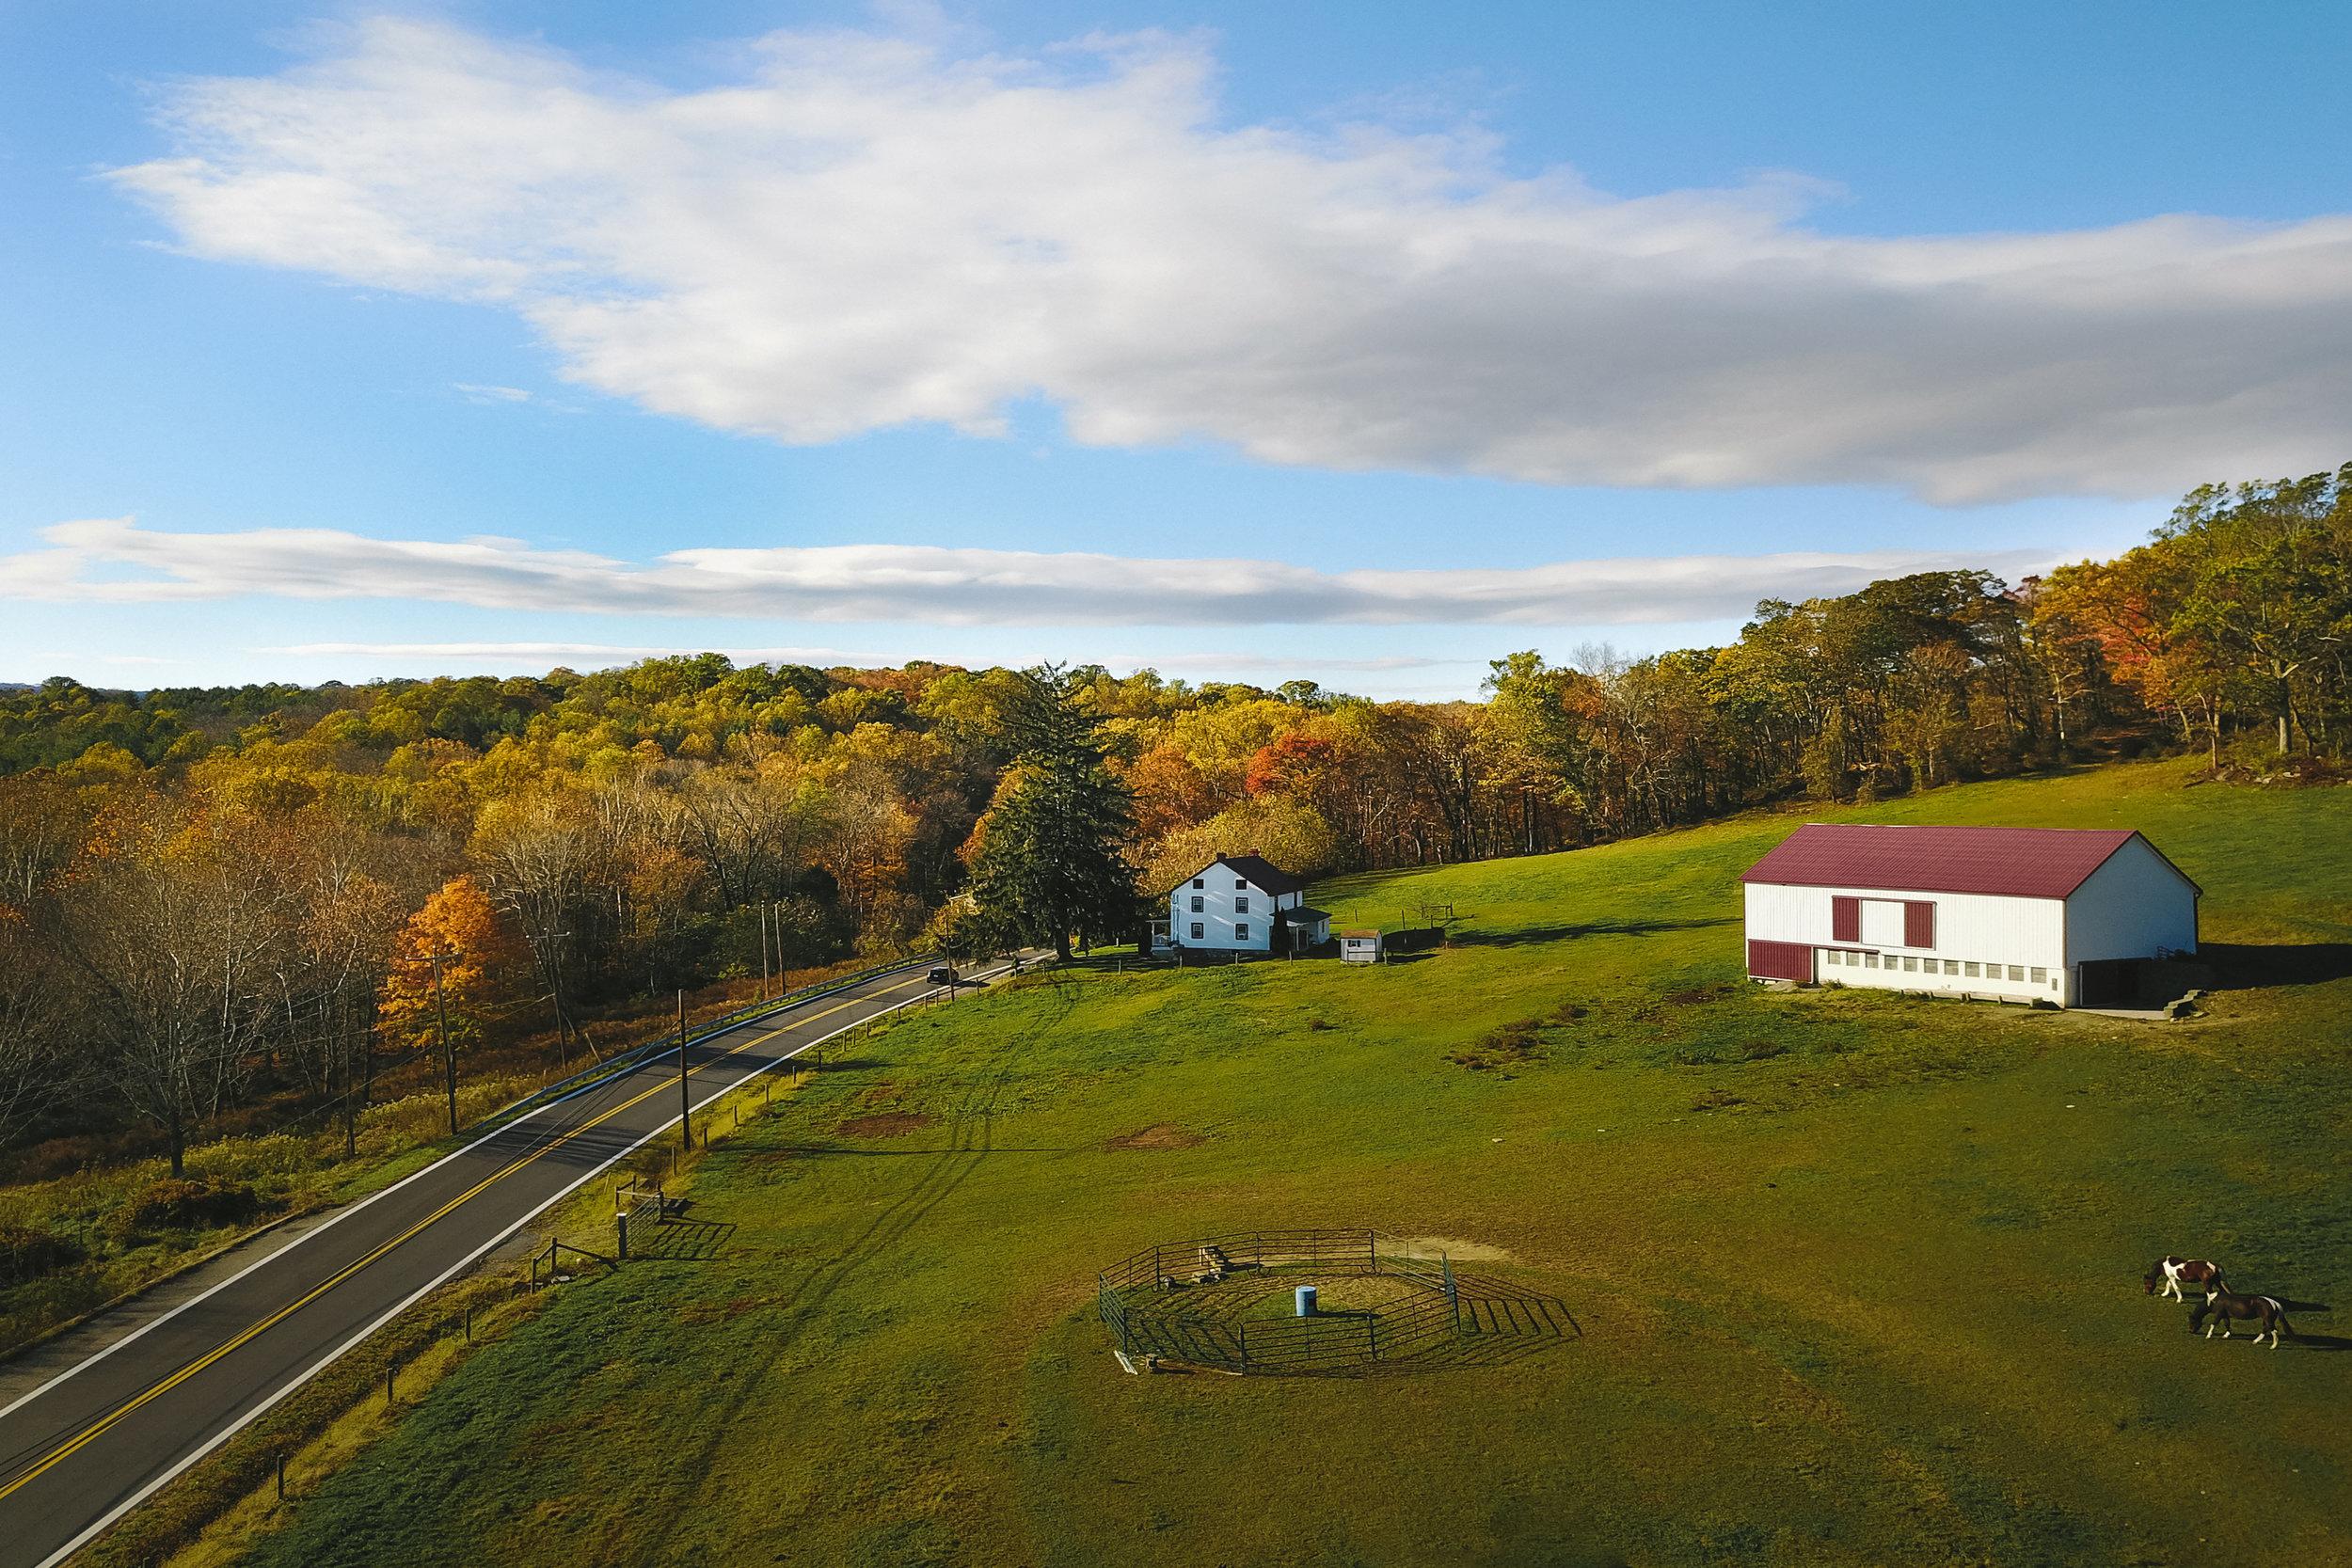 Landscapes_ Autumn Farm by David Scotto.jpg